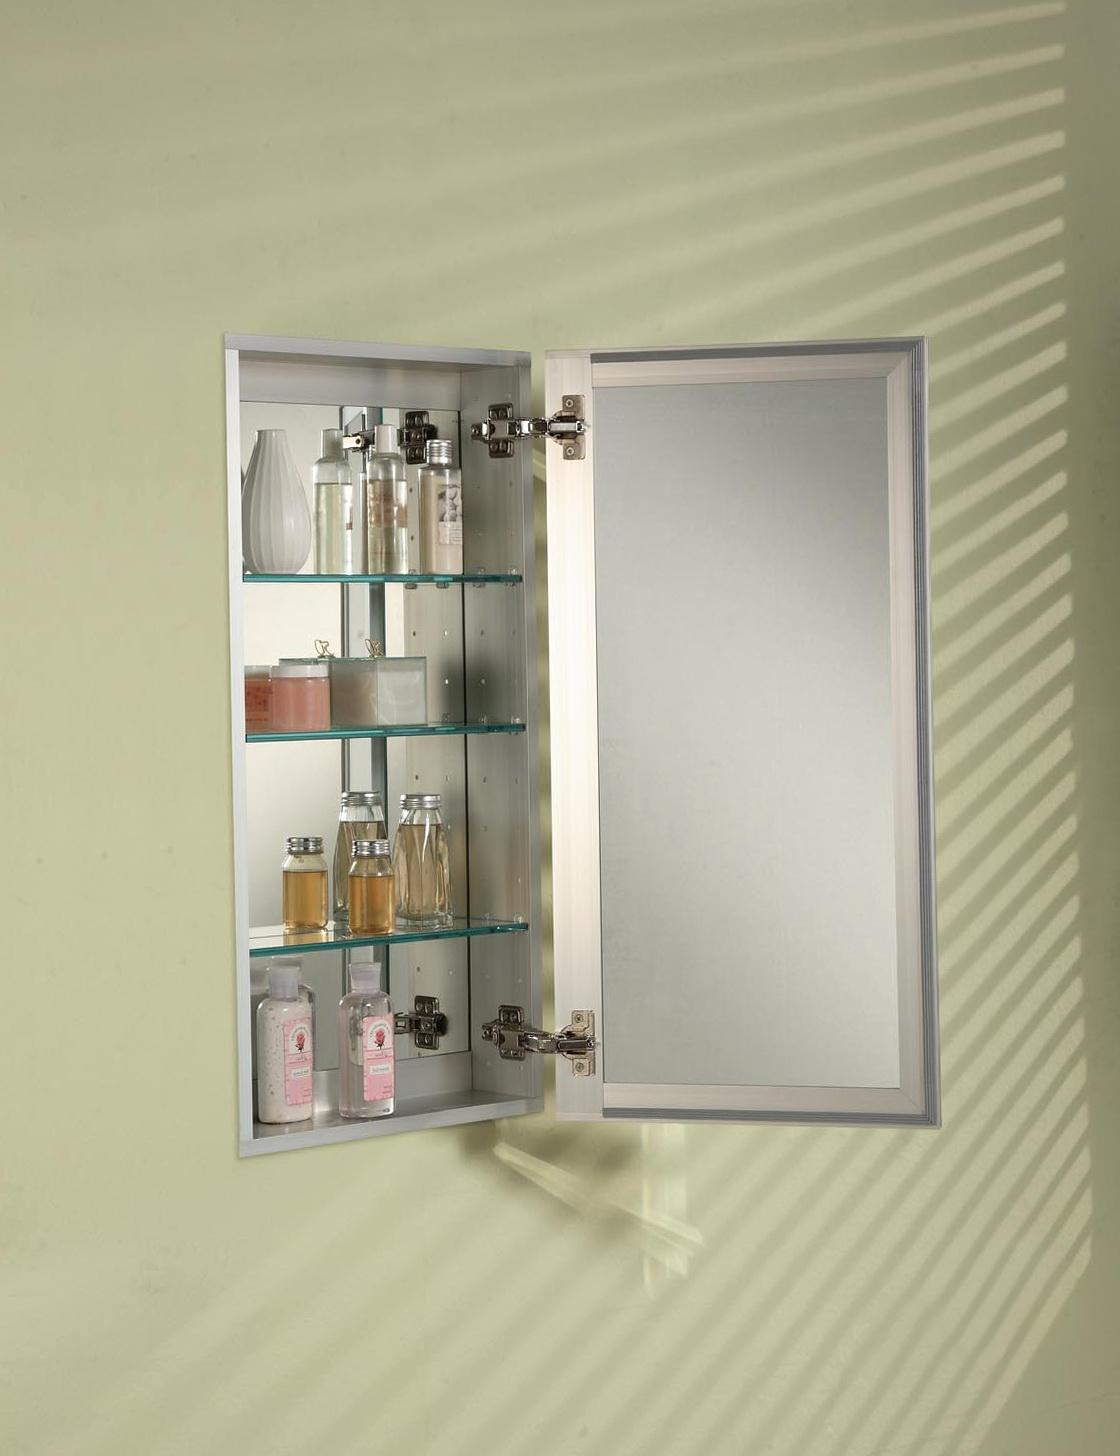 Zenith Medicine Cabinet Shelves